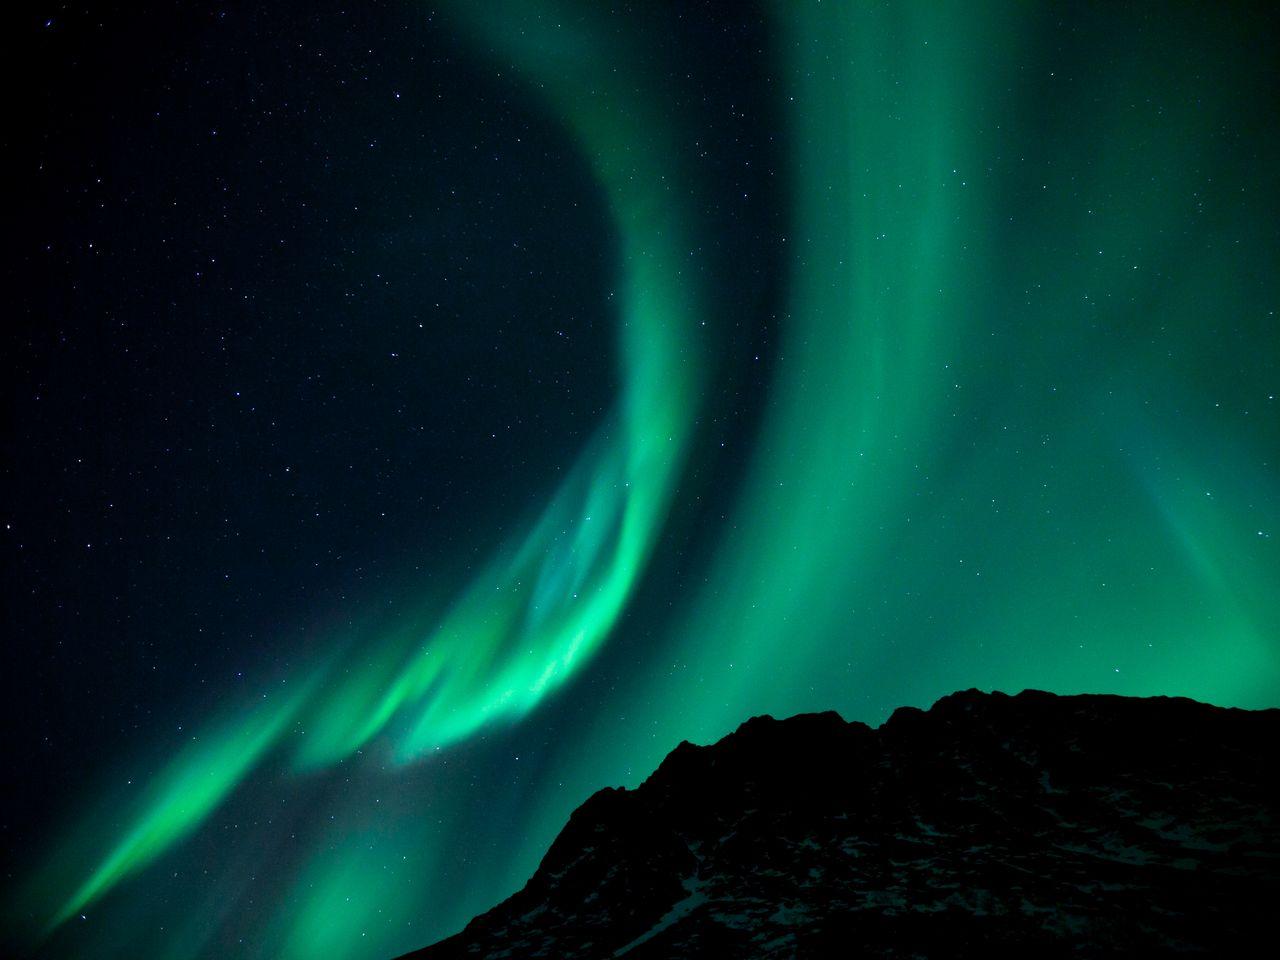 1280x960 Wallpaper northern lights, night, night sky, phenomenon